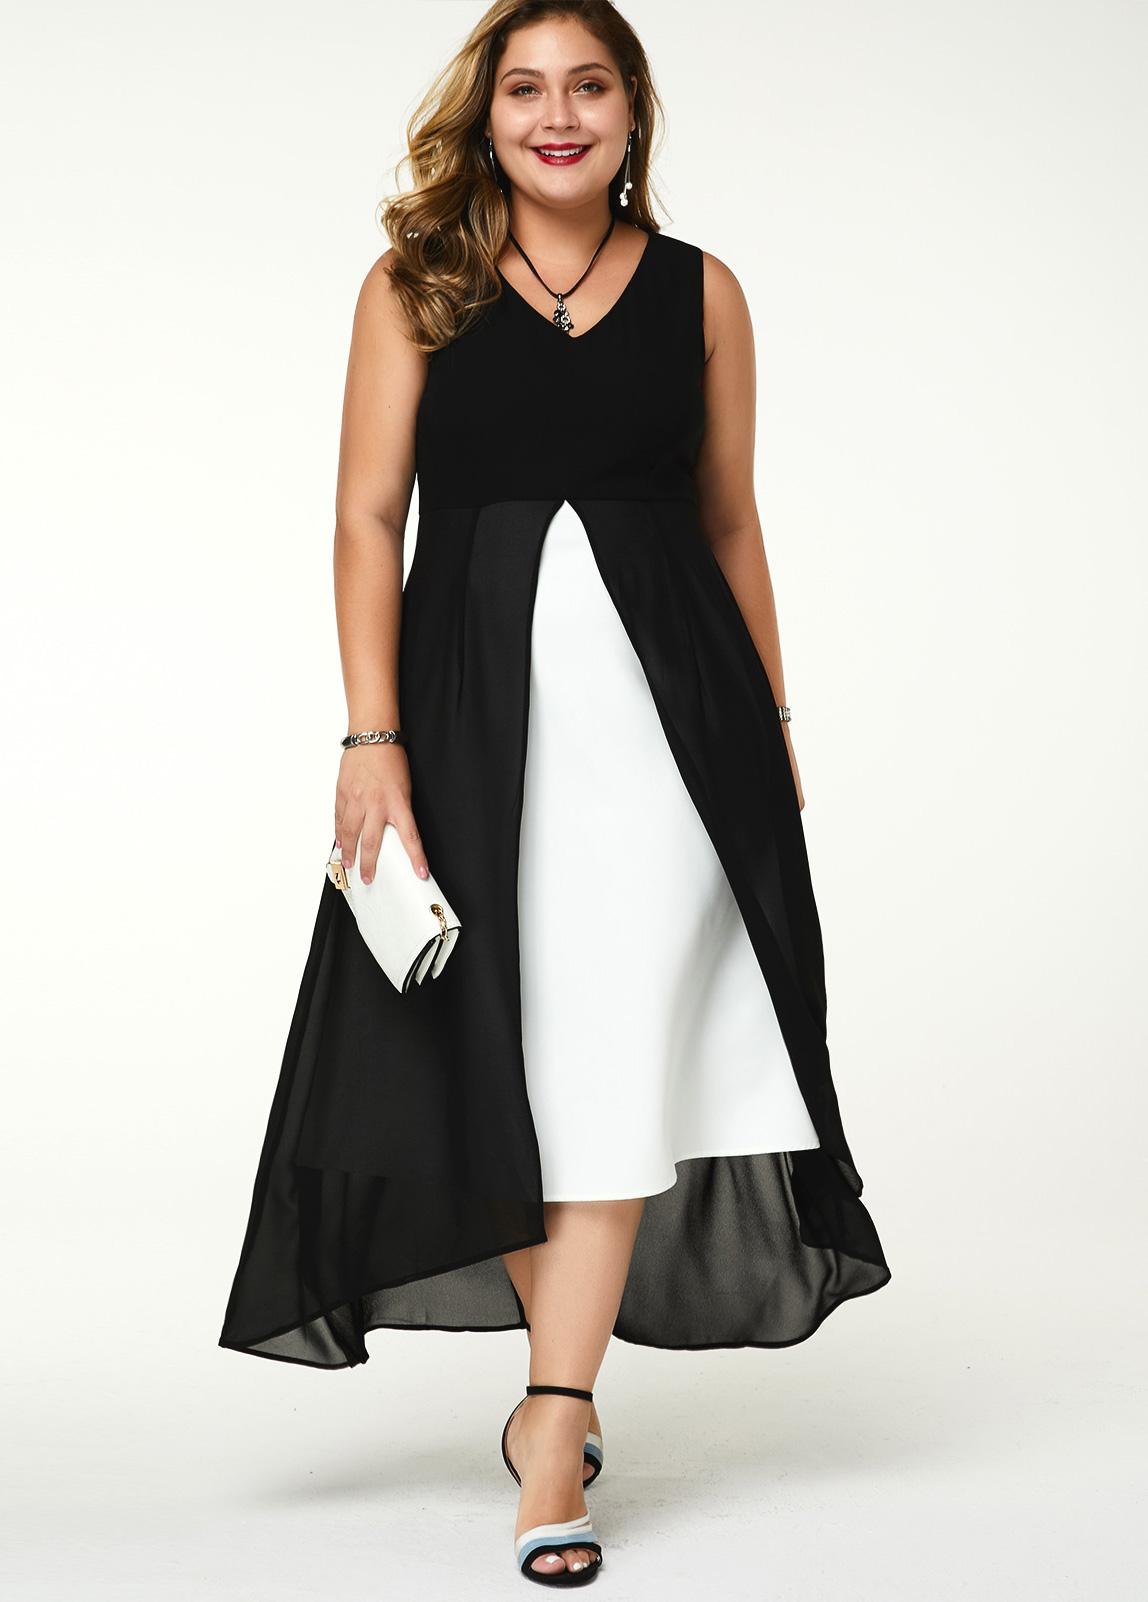 ROTITA Plus Size Sleeveless V Neck Contrast Dress